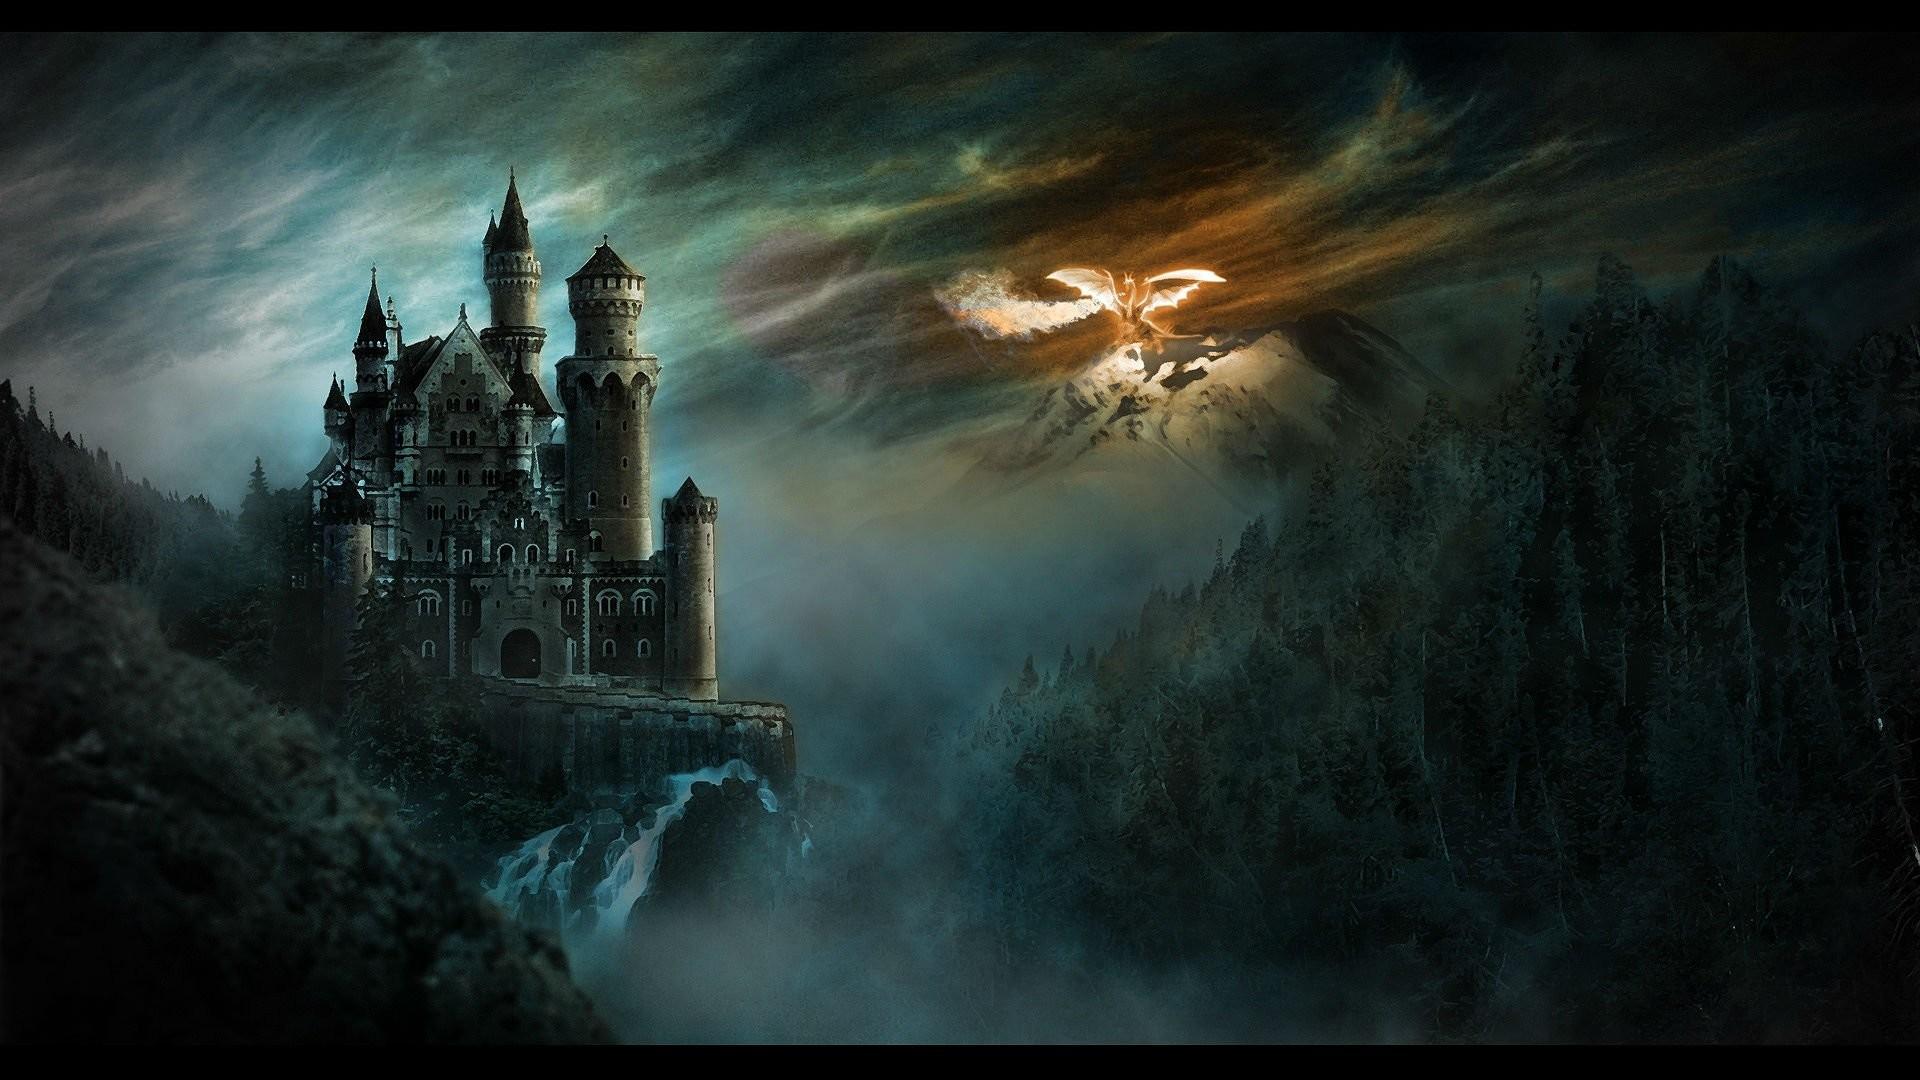 DUNGEONS DRAGONS Forgotten Realms magic rpg action adventure puzzle fantasy  warrior dragon wallpaper. . 1920×1080